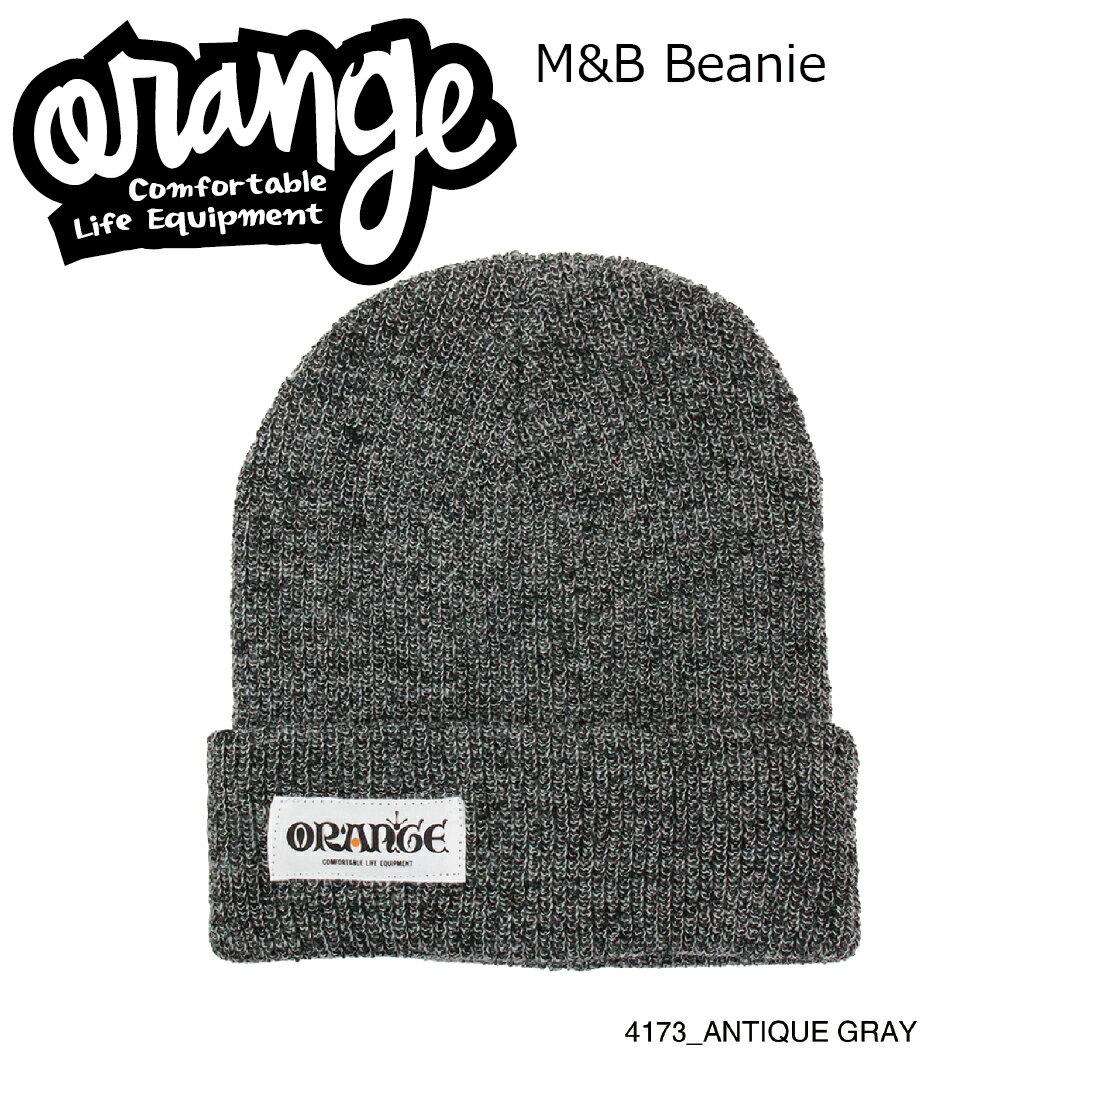 Oran'ge M&B Beanie 4173 ANTIQUE GRAY オレンジ エムアンドビー ビーニー ニットキャップ 2つ折り